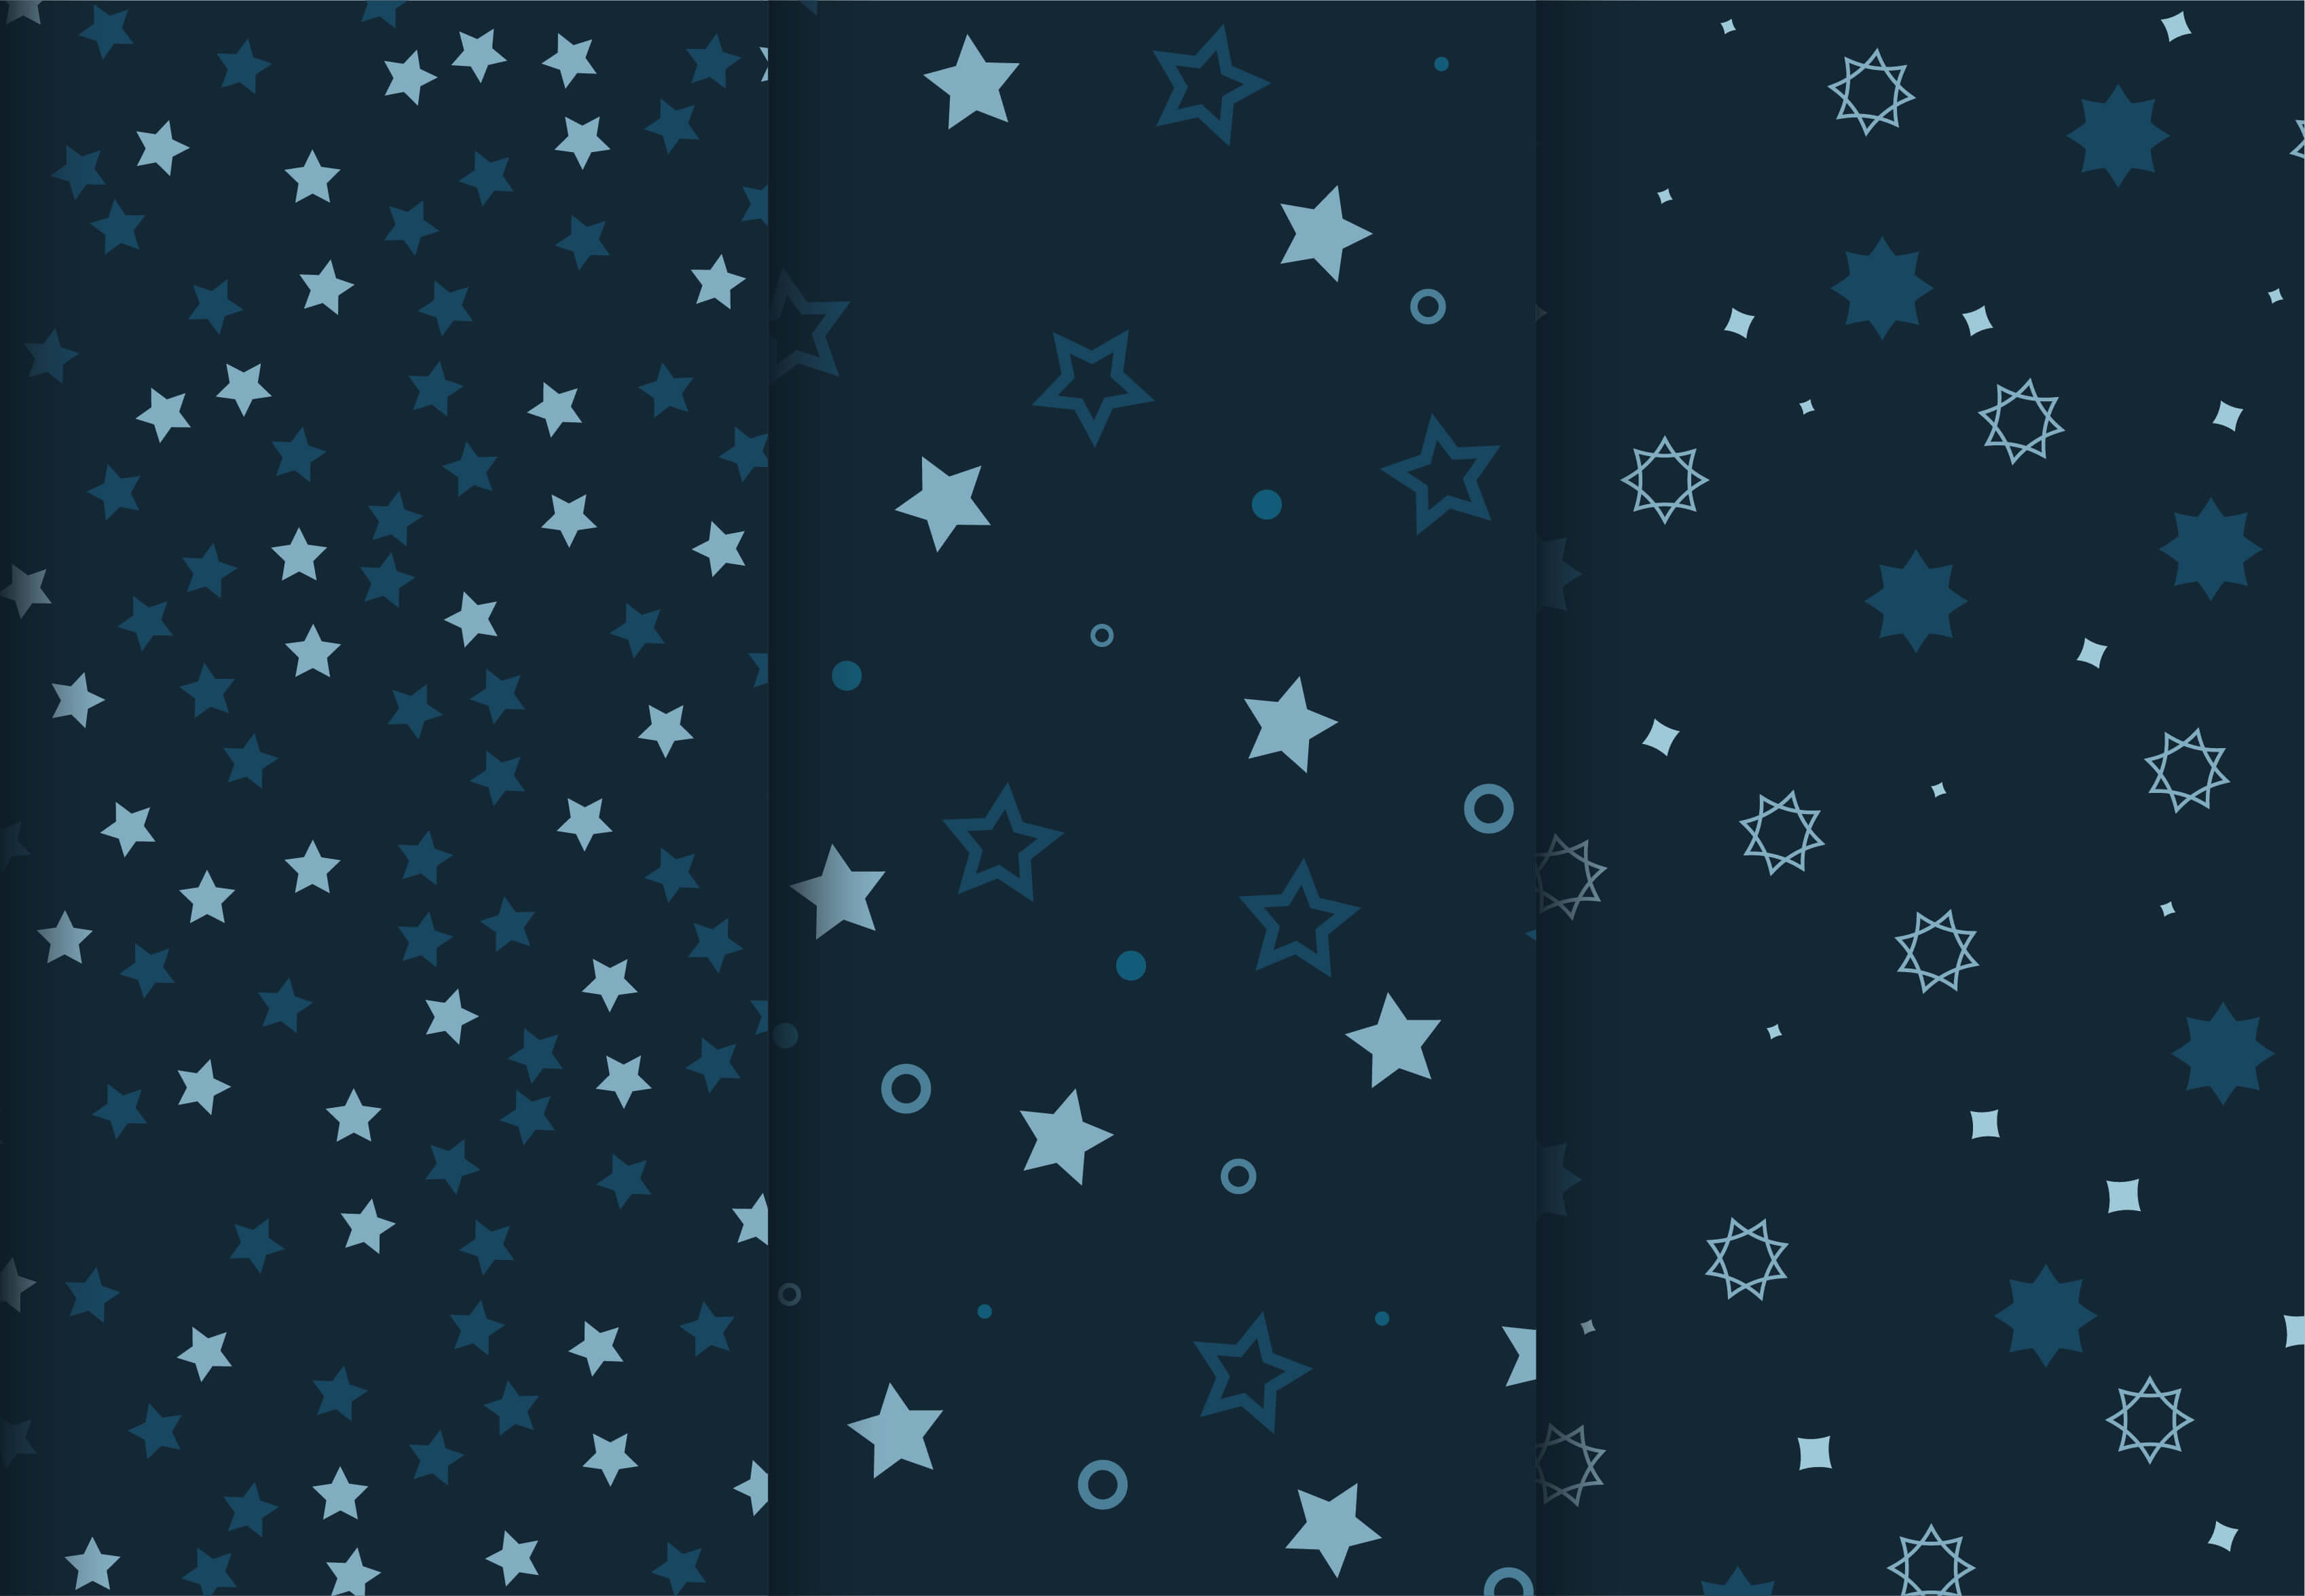 Blue star patterns